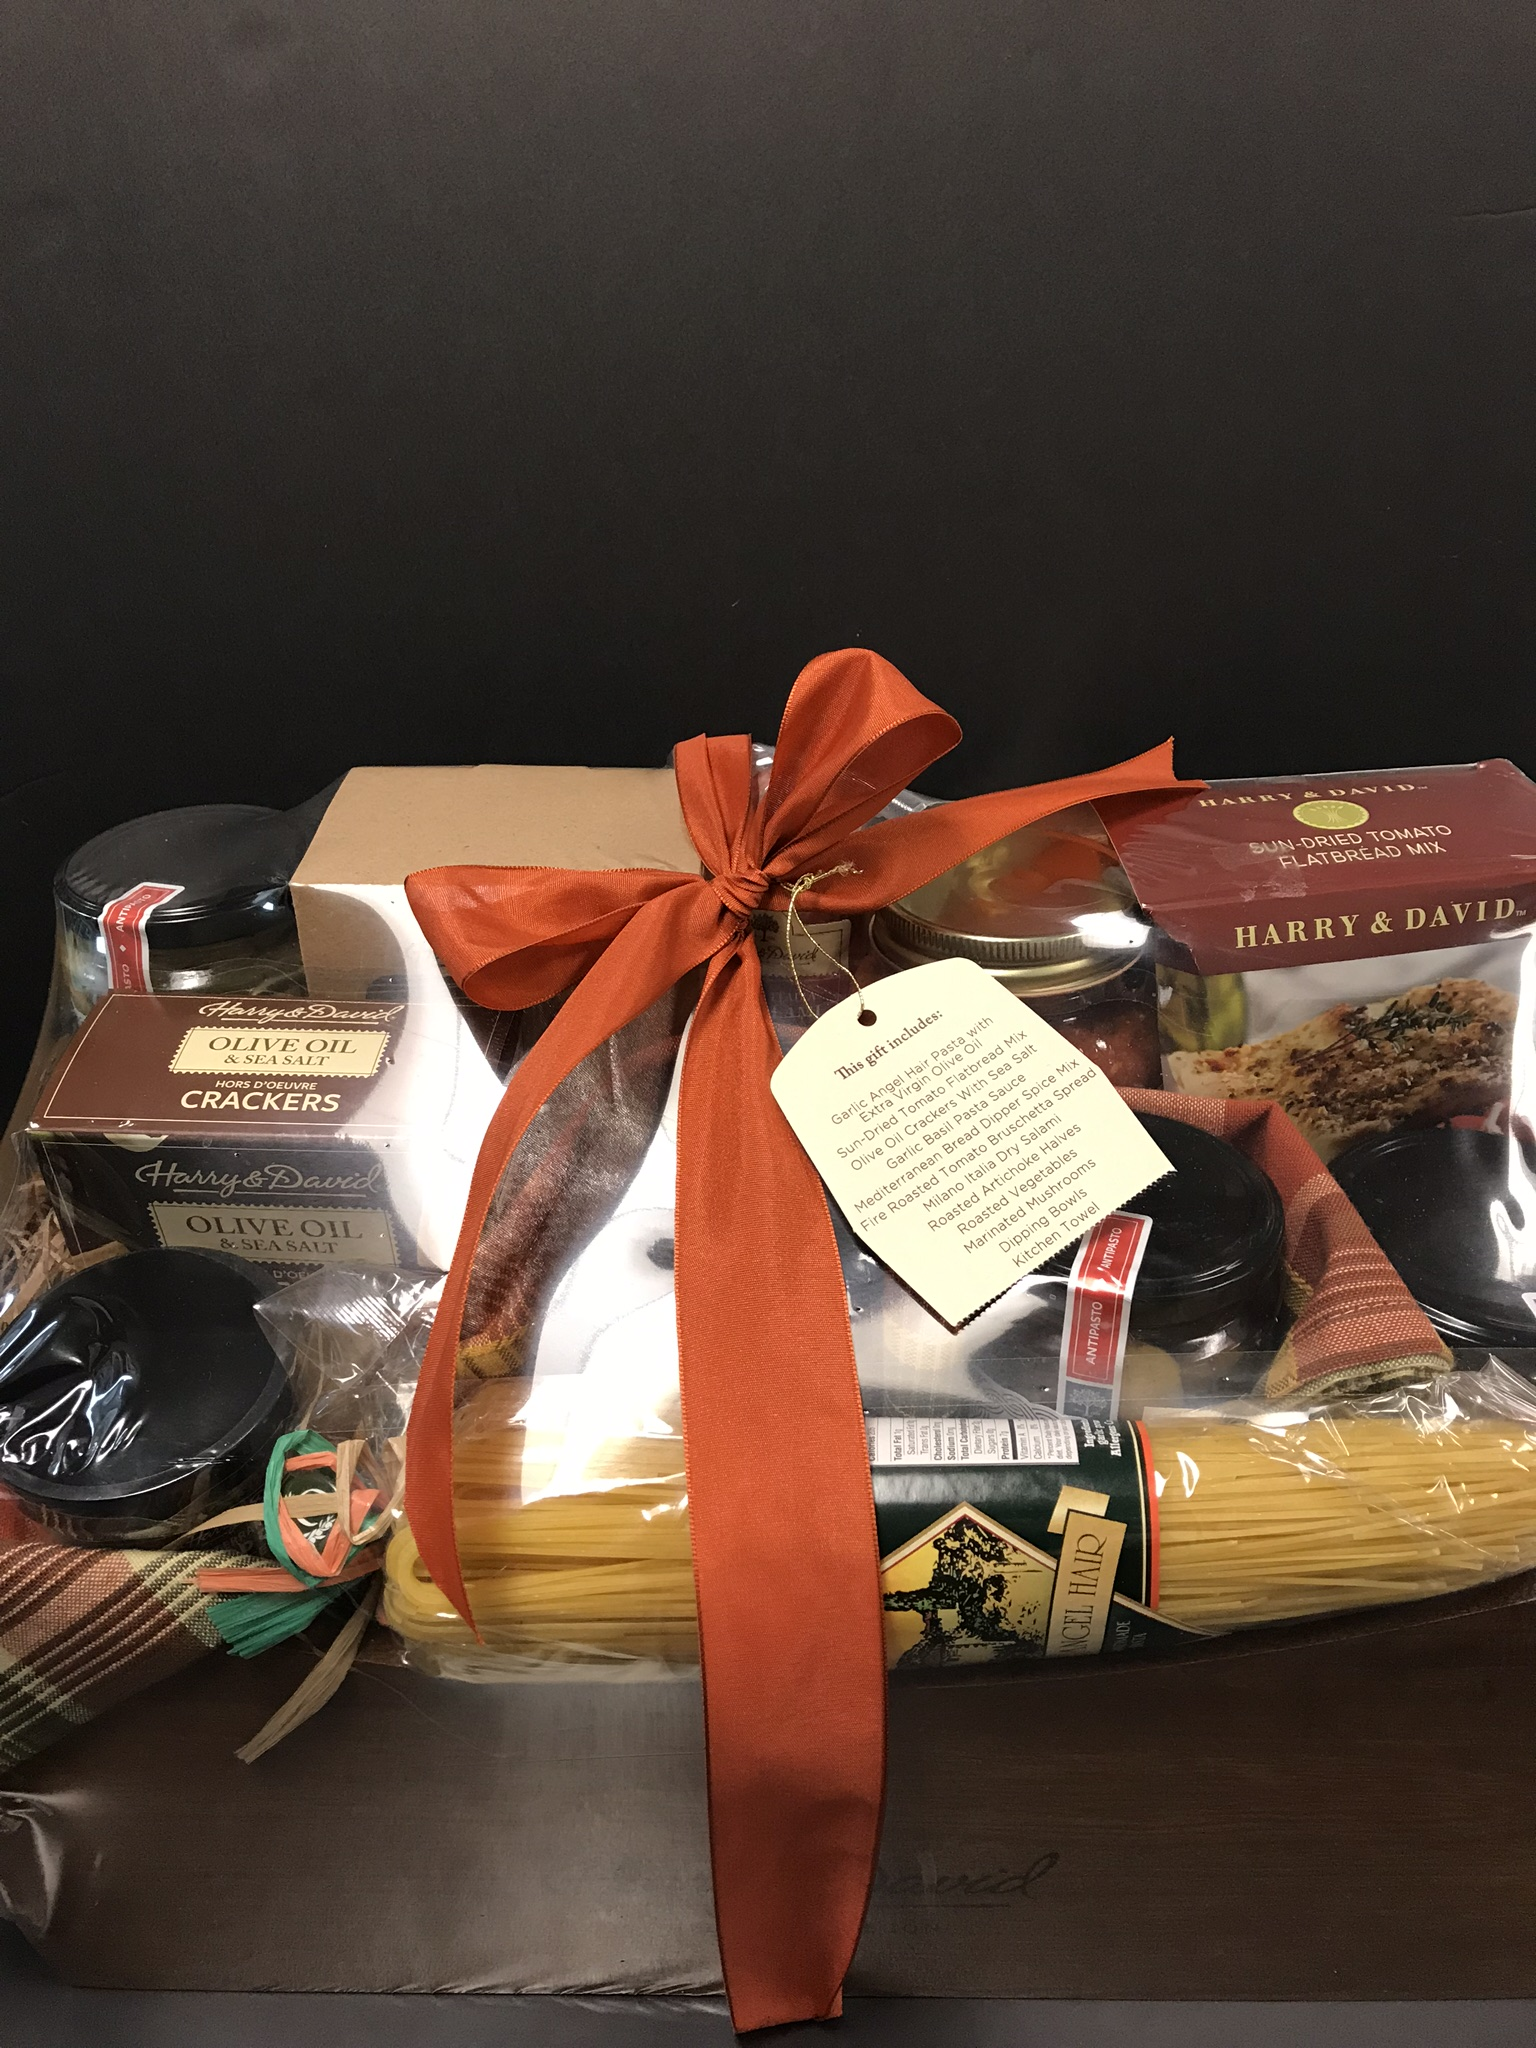 Harry & David Italian inspired gift basket - Value $40